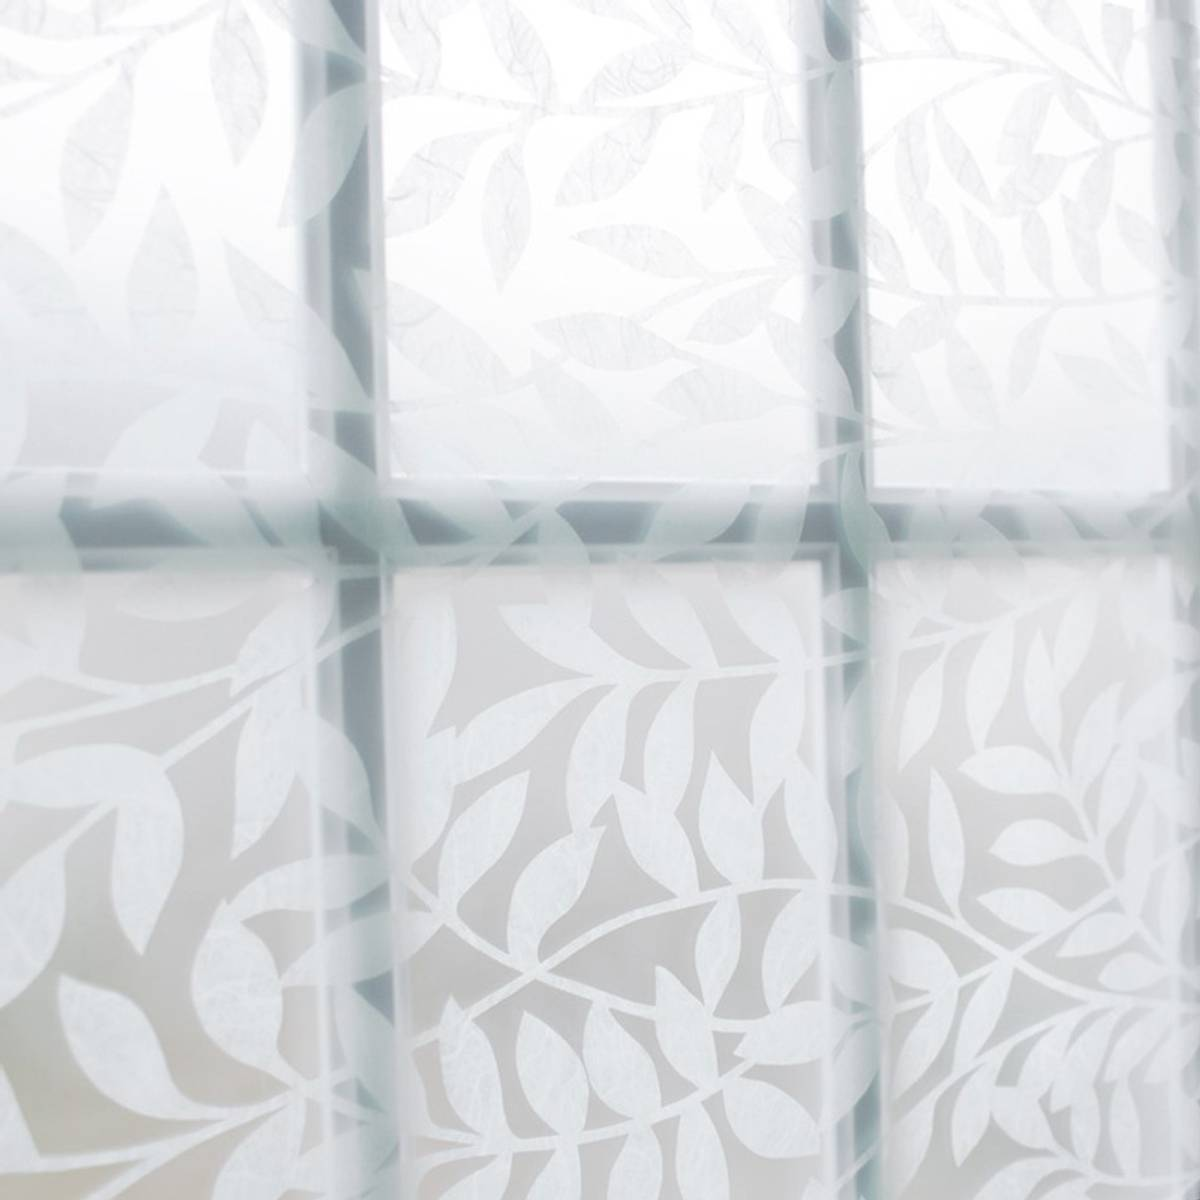 Vareprøve: Static Jane vindusfolie